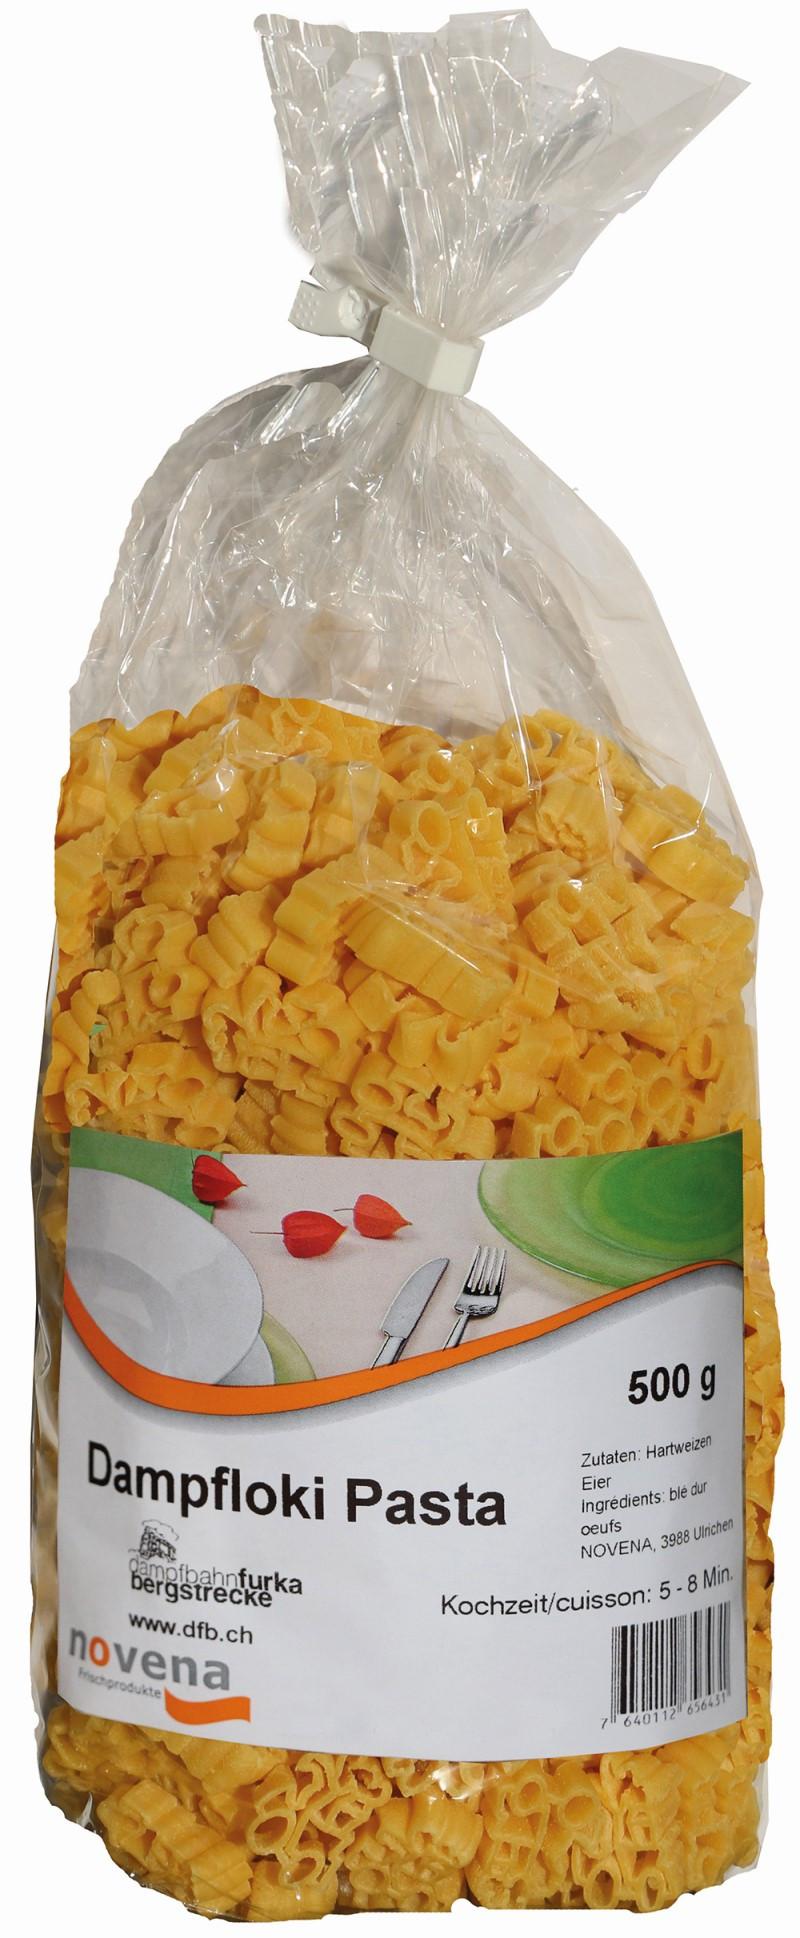 Dampfloki-Pasta 500g